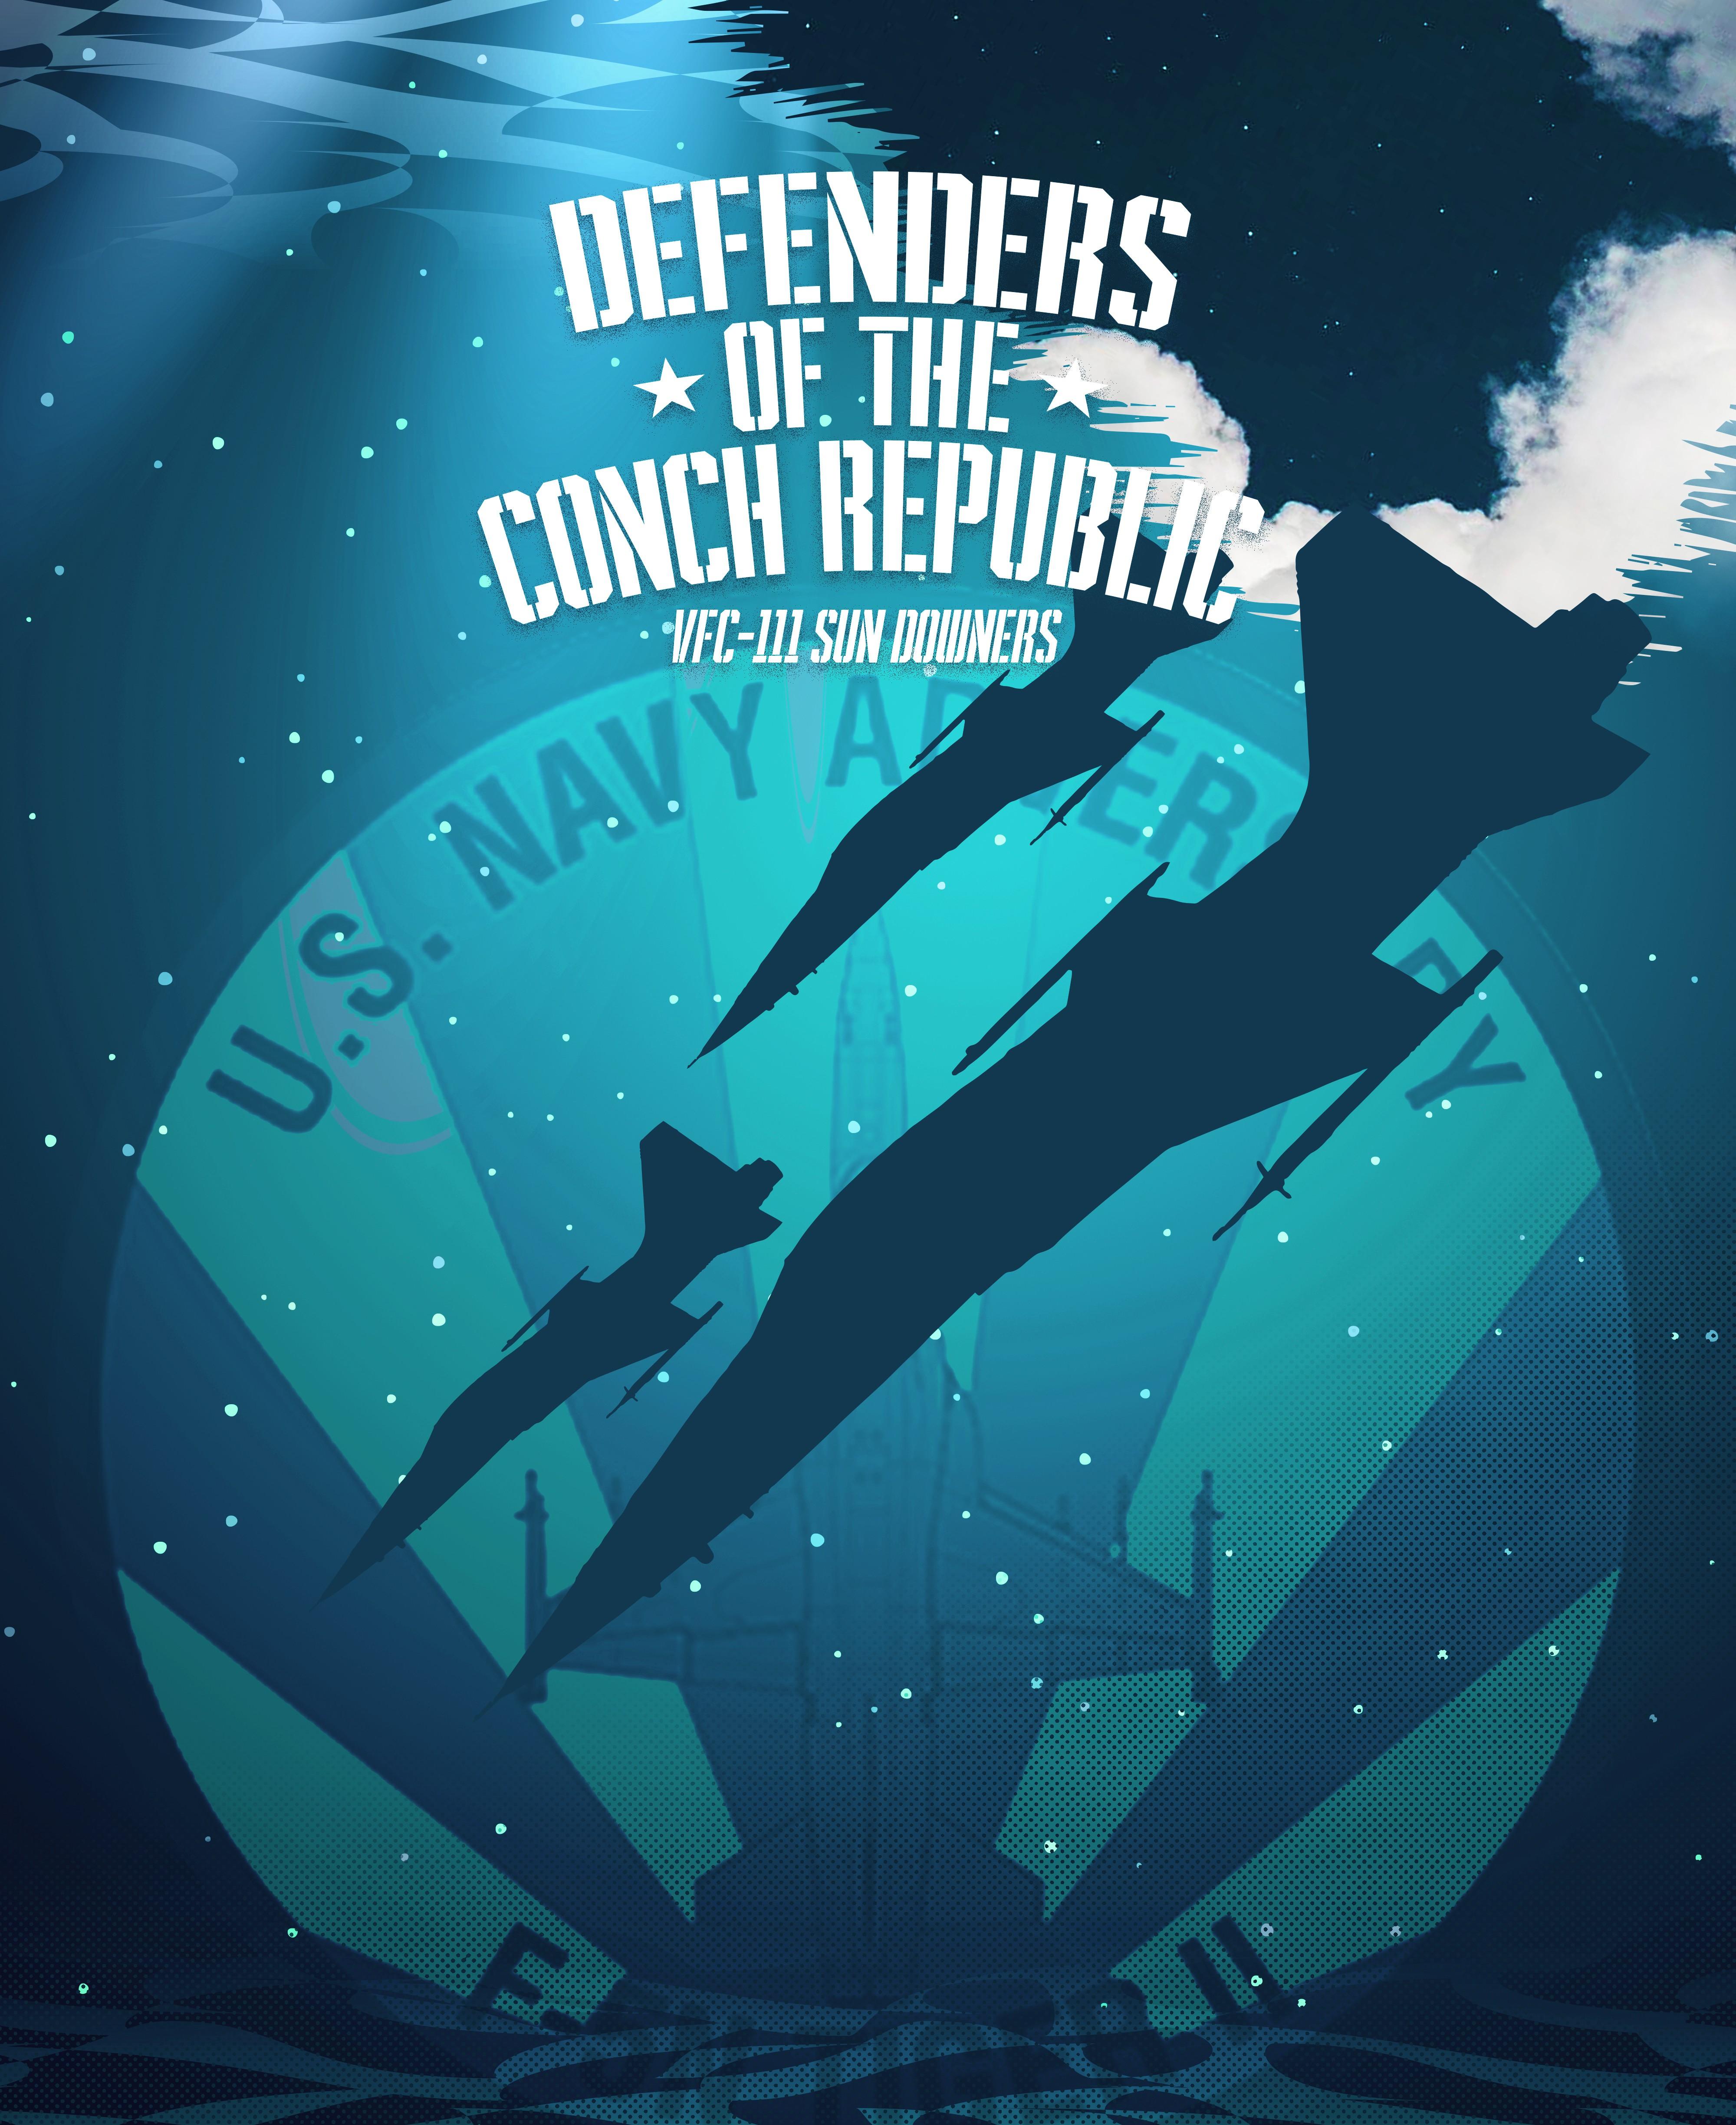 Key West based U.S. Navy fighter squadron fishing shirt